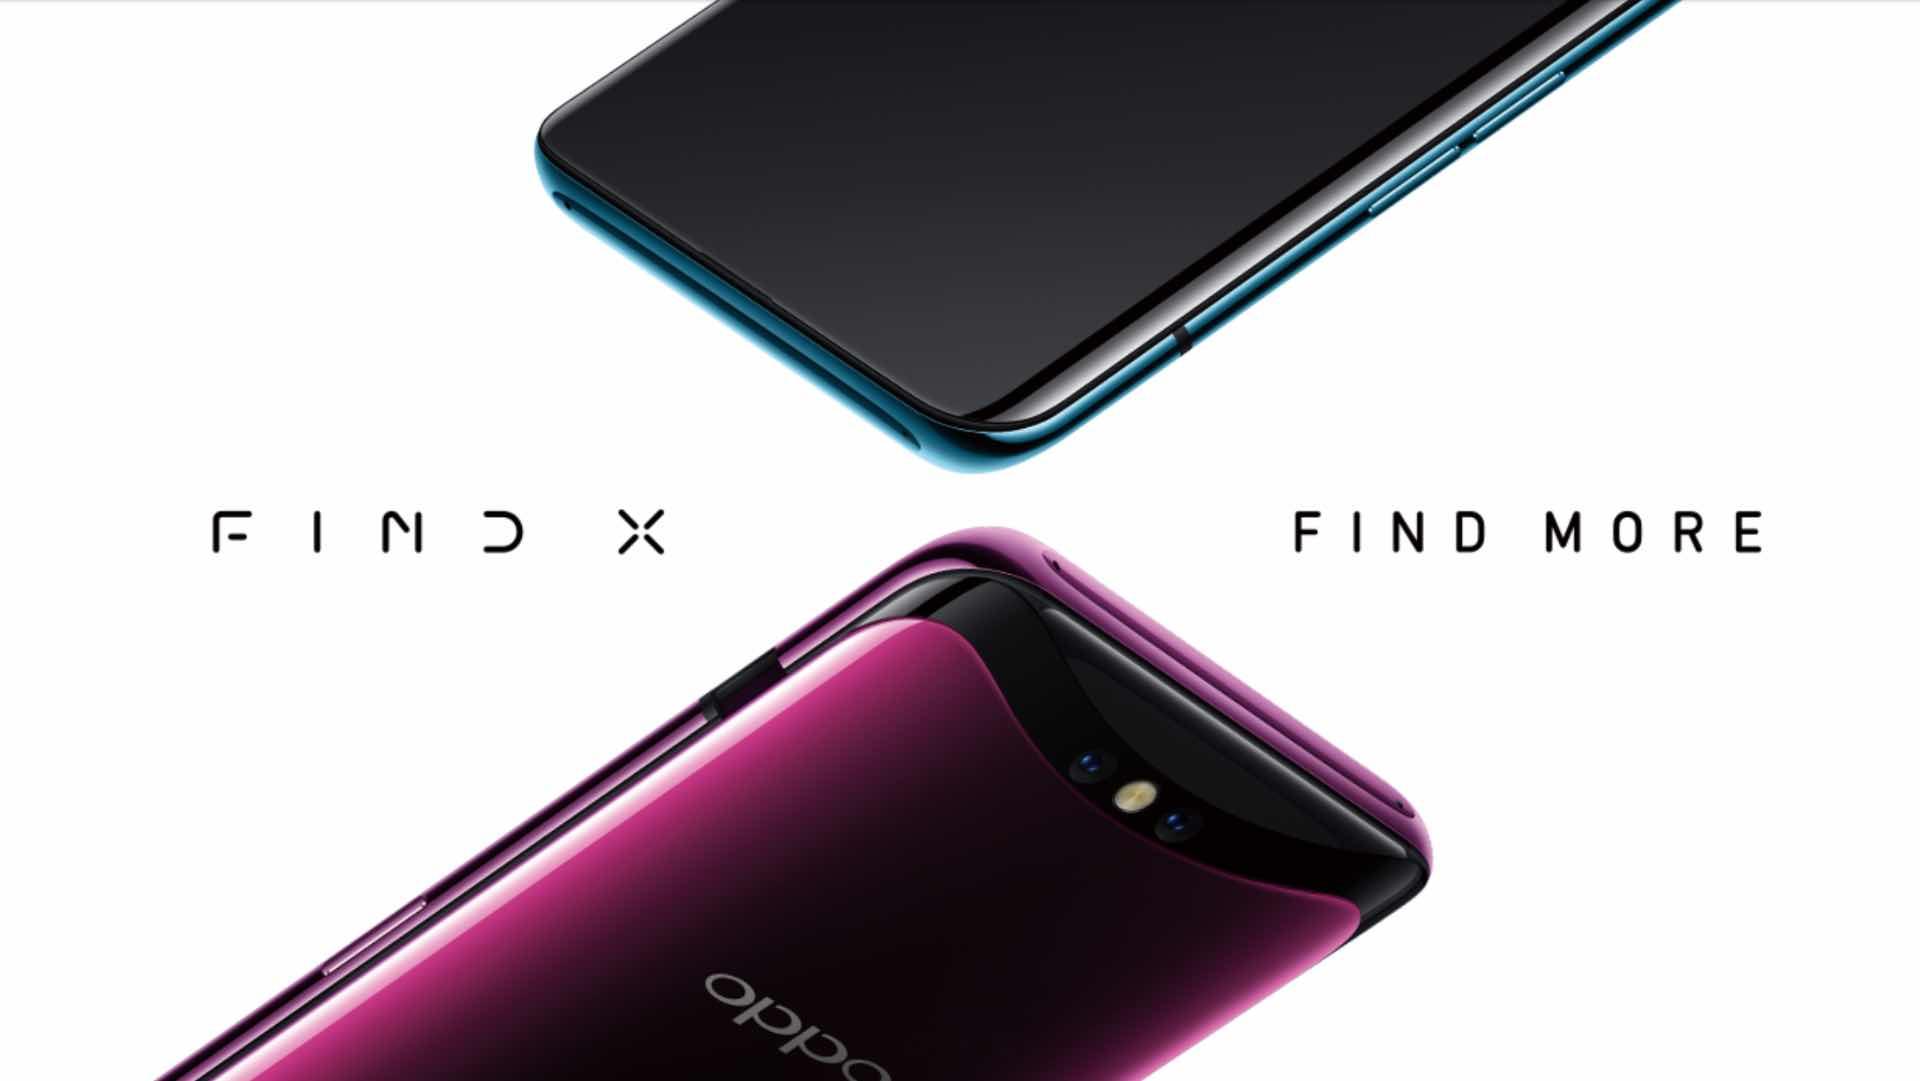 Oppo має амбітні плани на 2019 рік